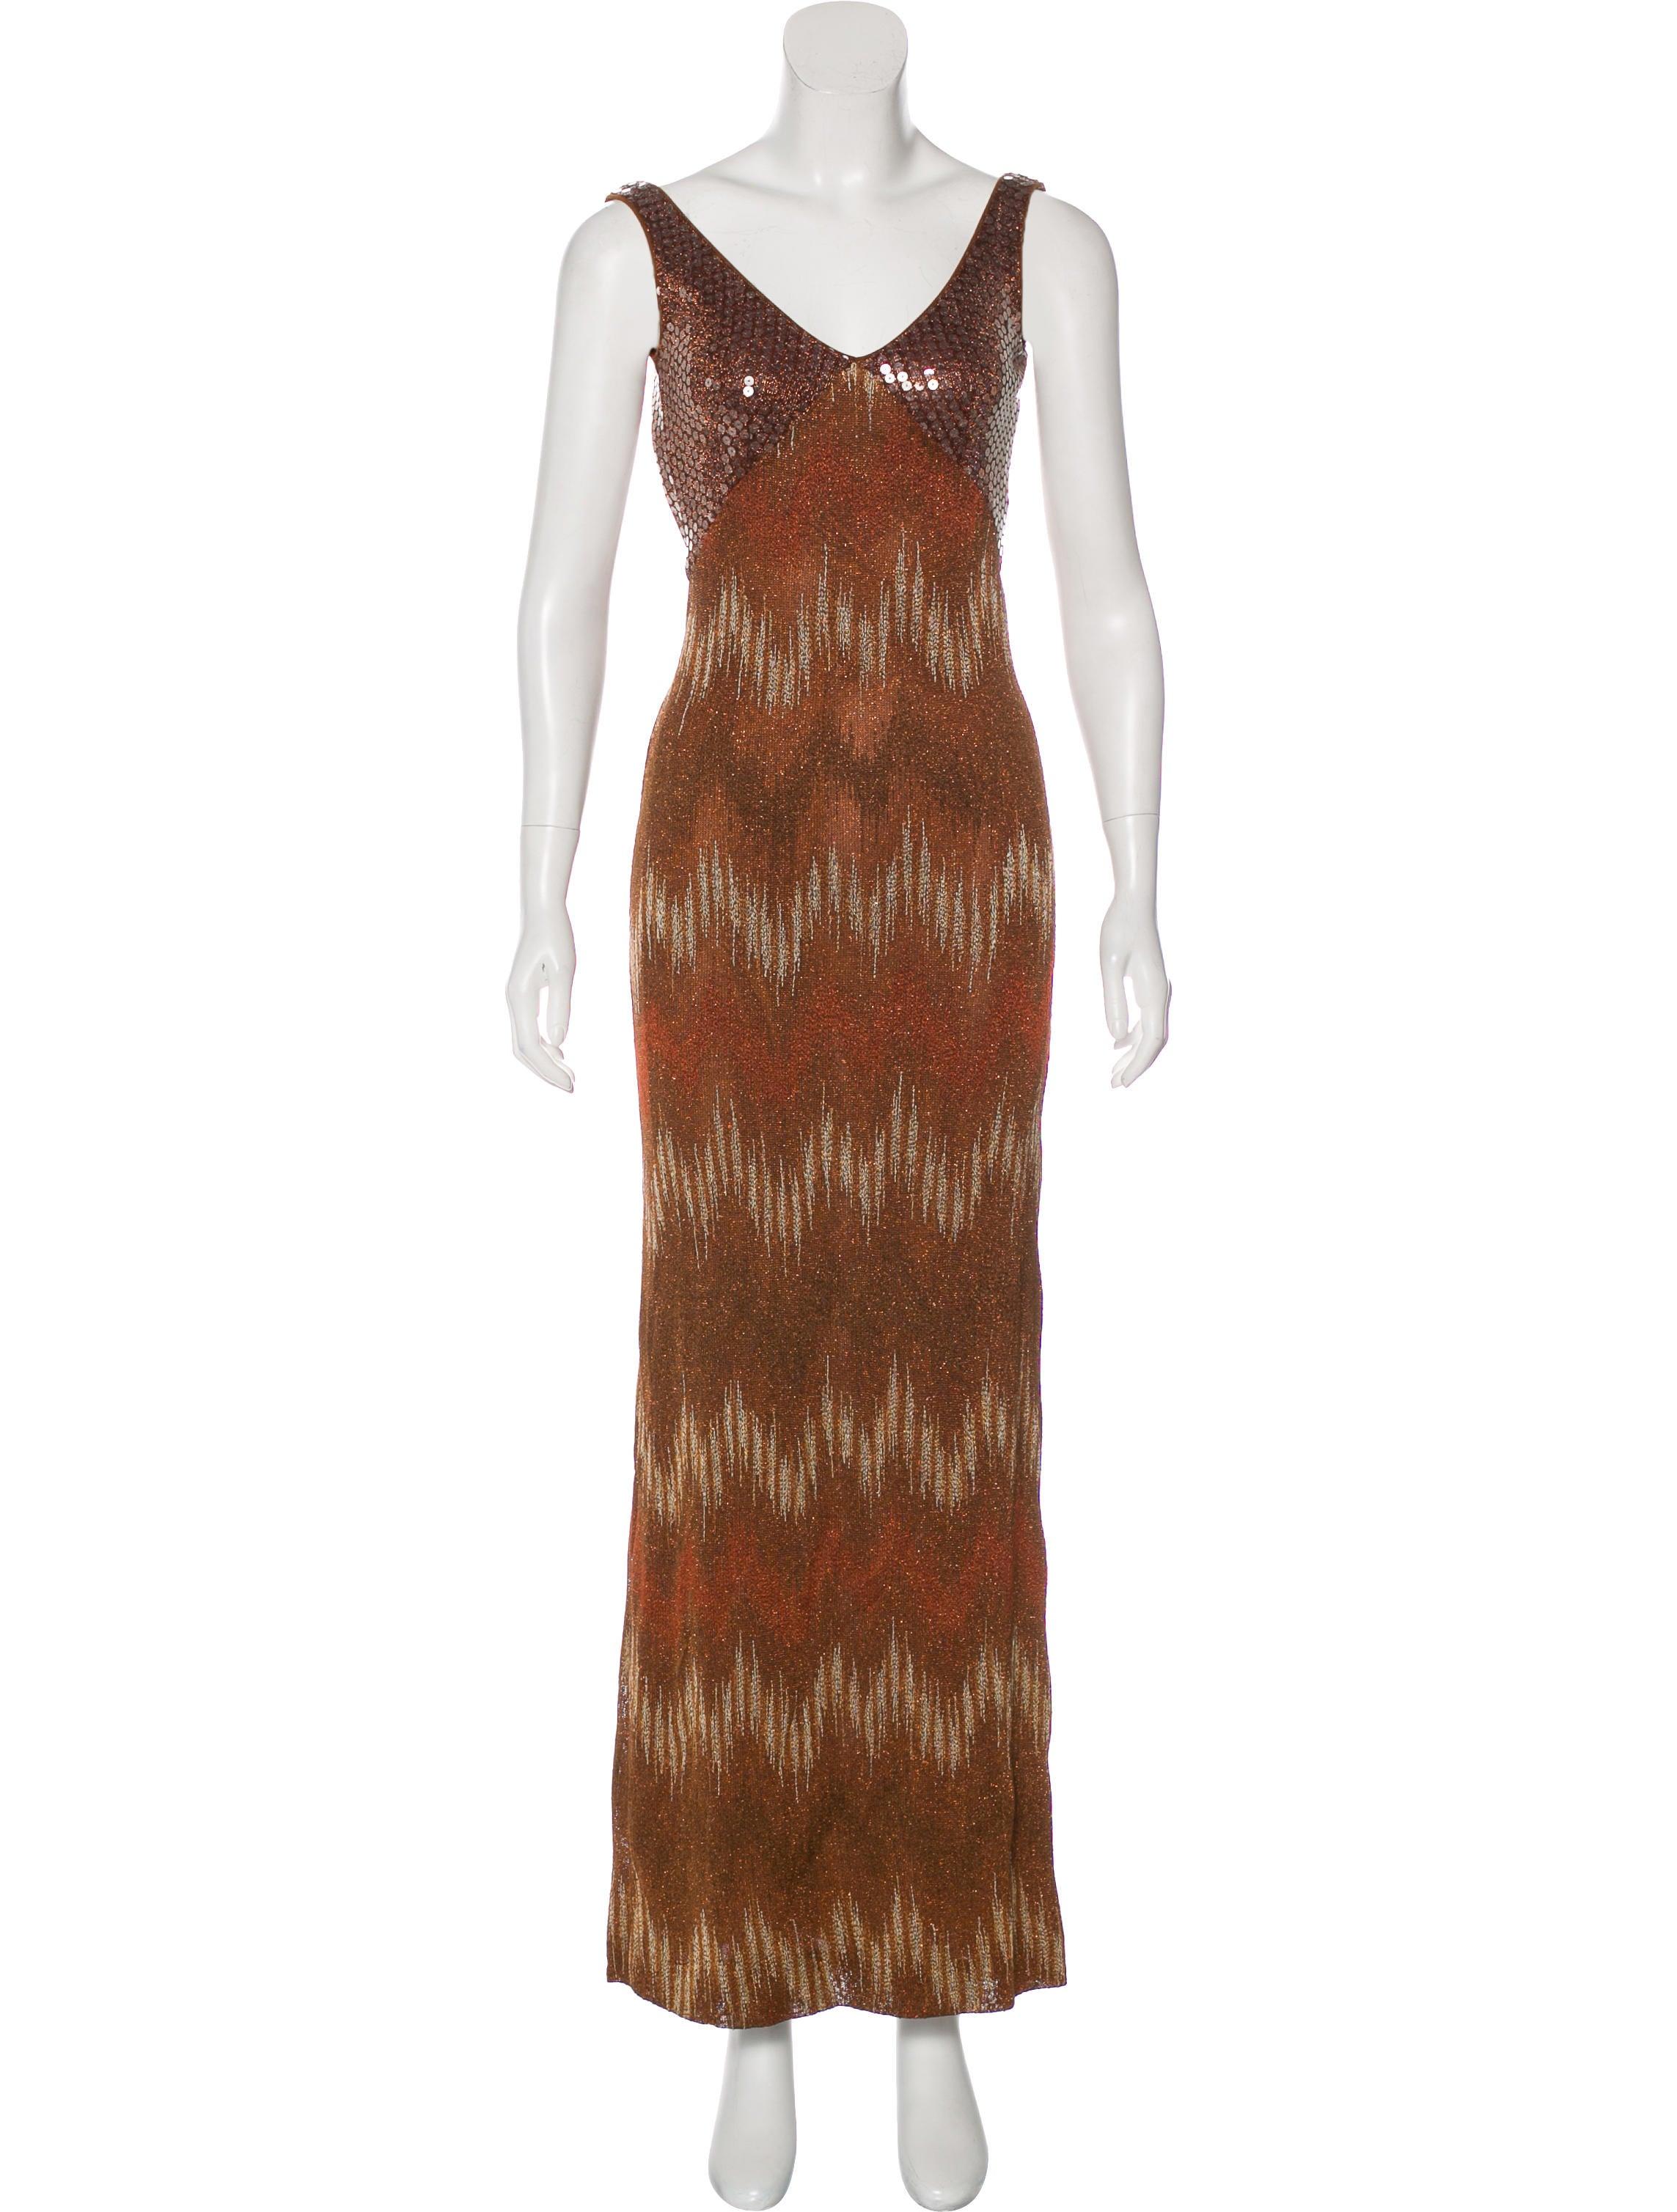 Missoni Metallic Evening Dress - Clothing - MIS51515 | The RealReal